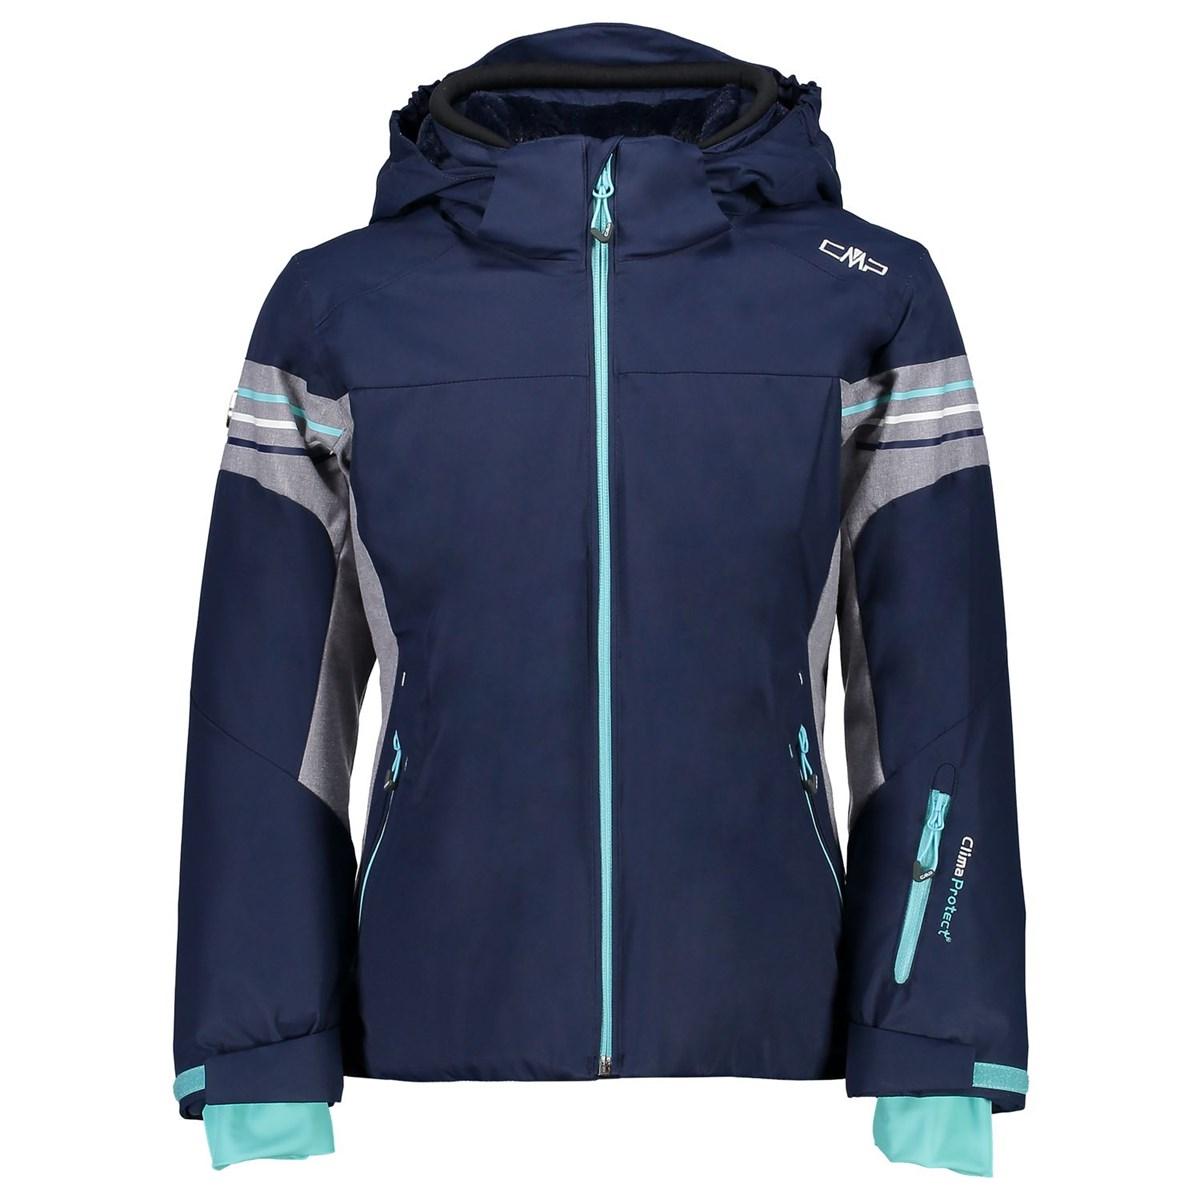 7f6feb4ed CMP Campagnolo Cleo Girls insulated ski jacket Navy Blue £76.76